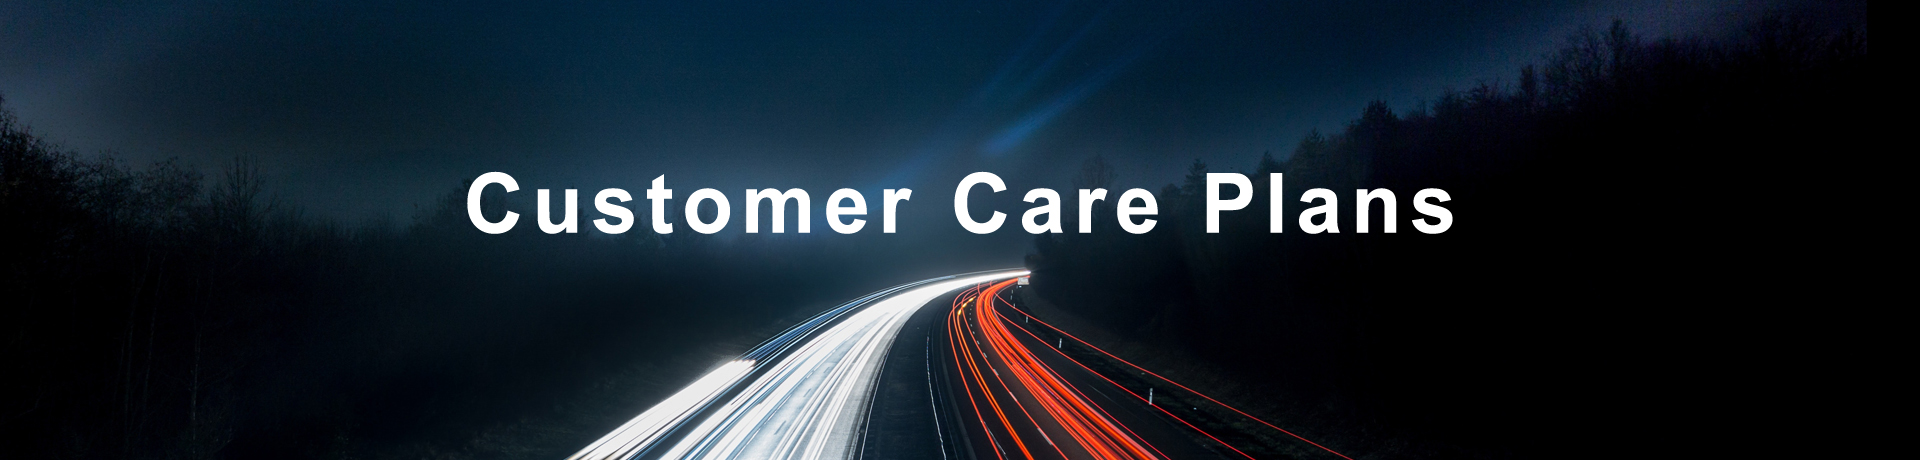 customer-care-plane-banner